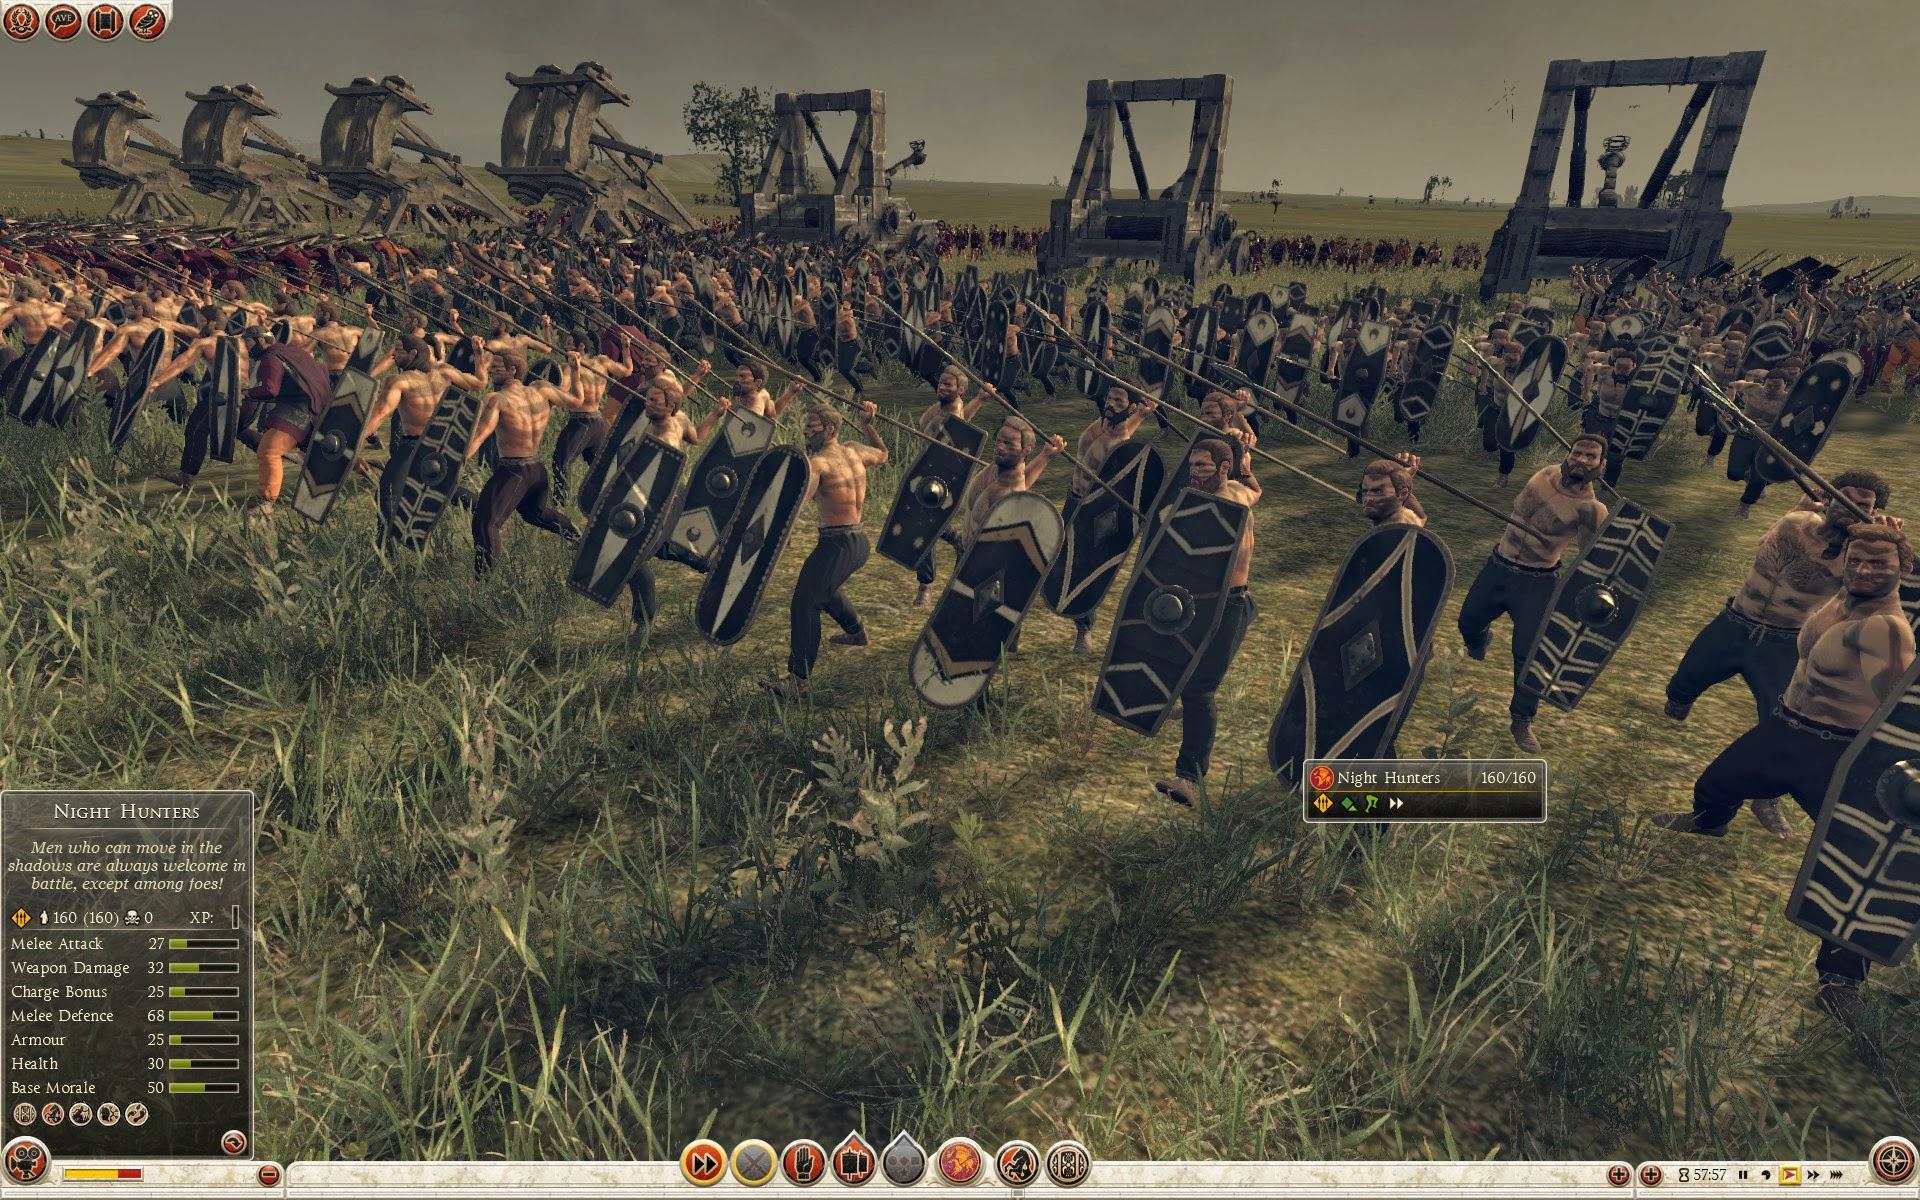 Night Hunters - Suebi - Total War: Rome II - Royal Military Academy